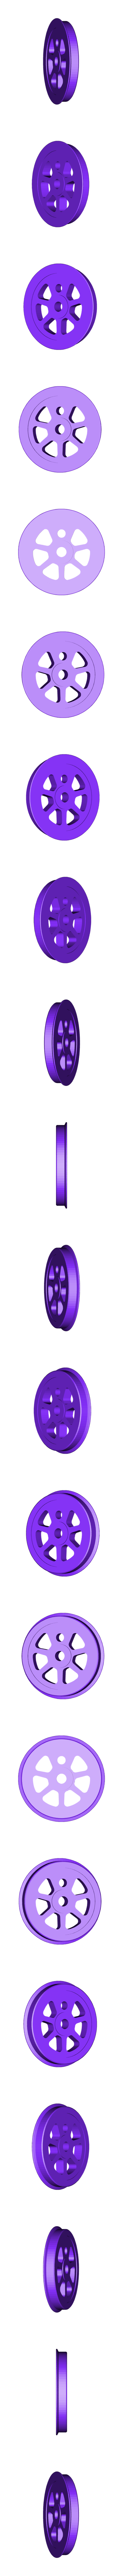 wheel.stl Download STL file train wheel, train wheel • 3D print template, Andrieux